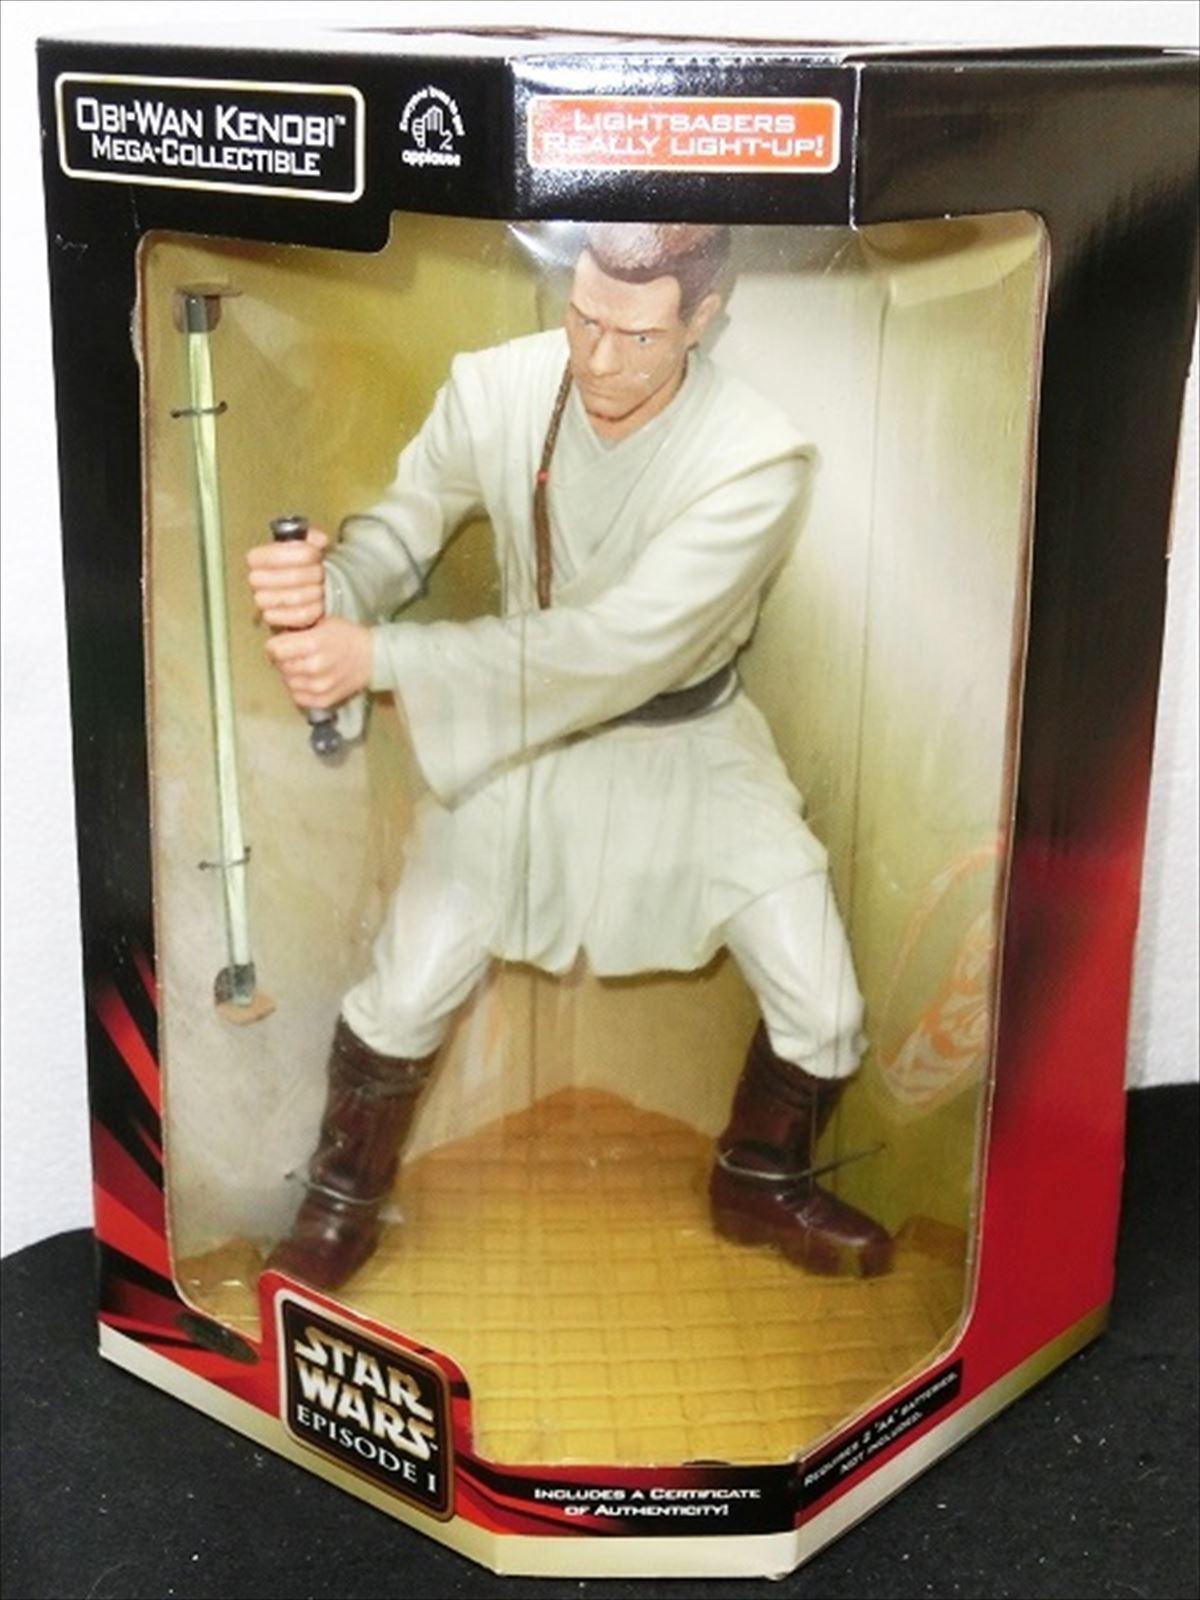 ventas al por mayor Estrella Wars episodio 1 1 1 Mega Coleccionable Obi-Wan Kenobi de Japón F S  tiendas minoristas